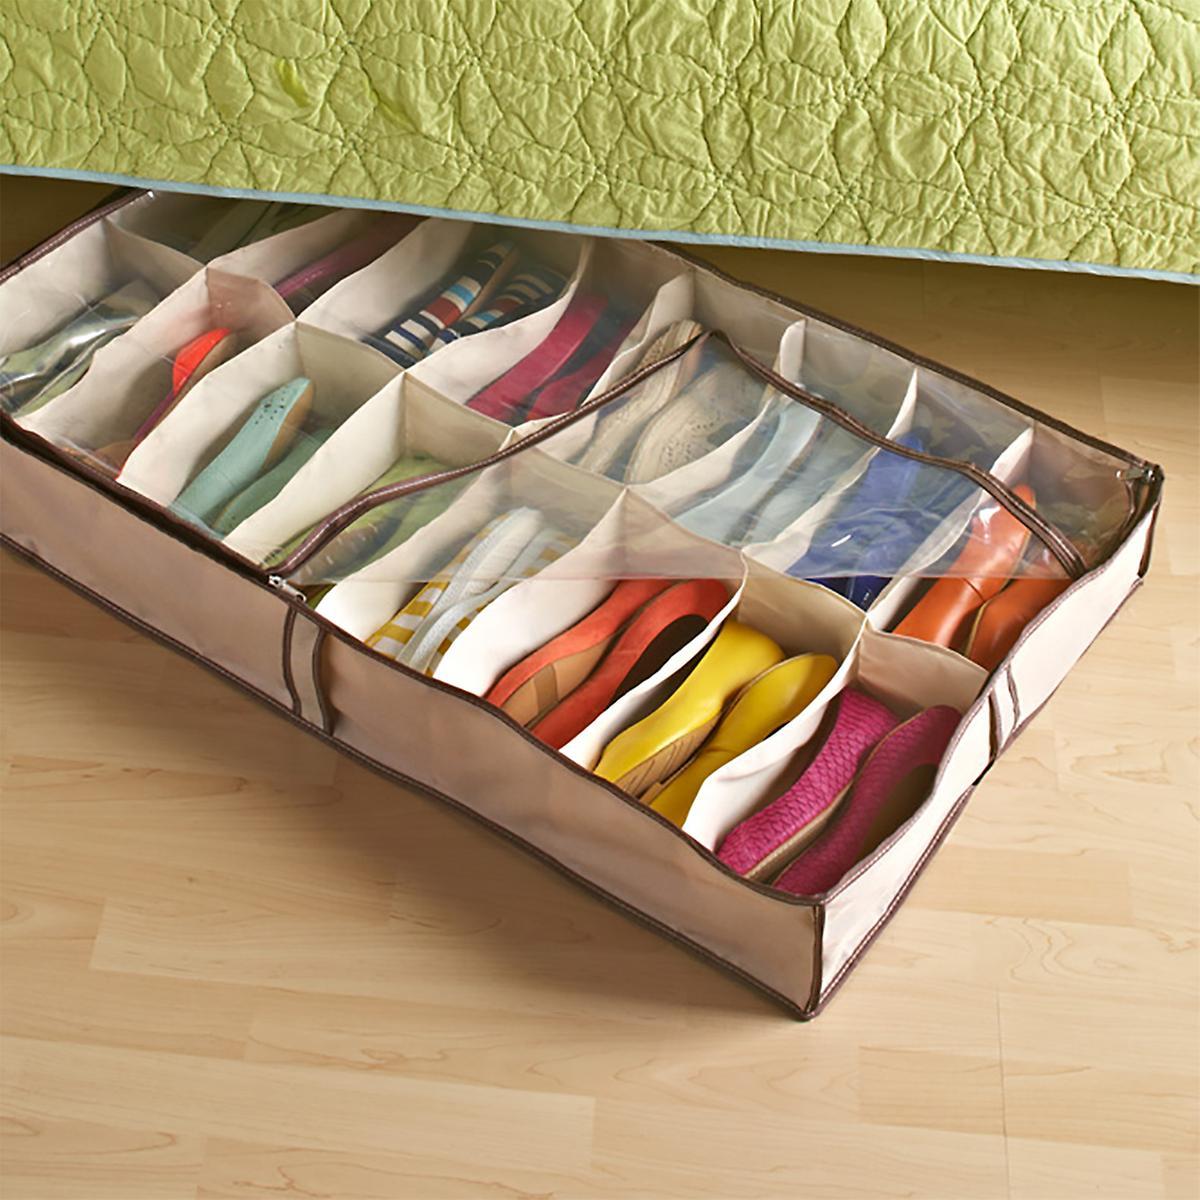 Tweed 16-Pair Under Bed Shoe Organizer